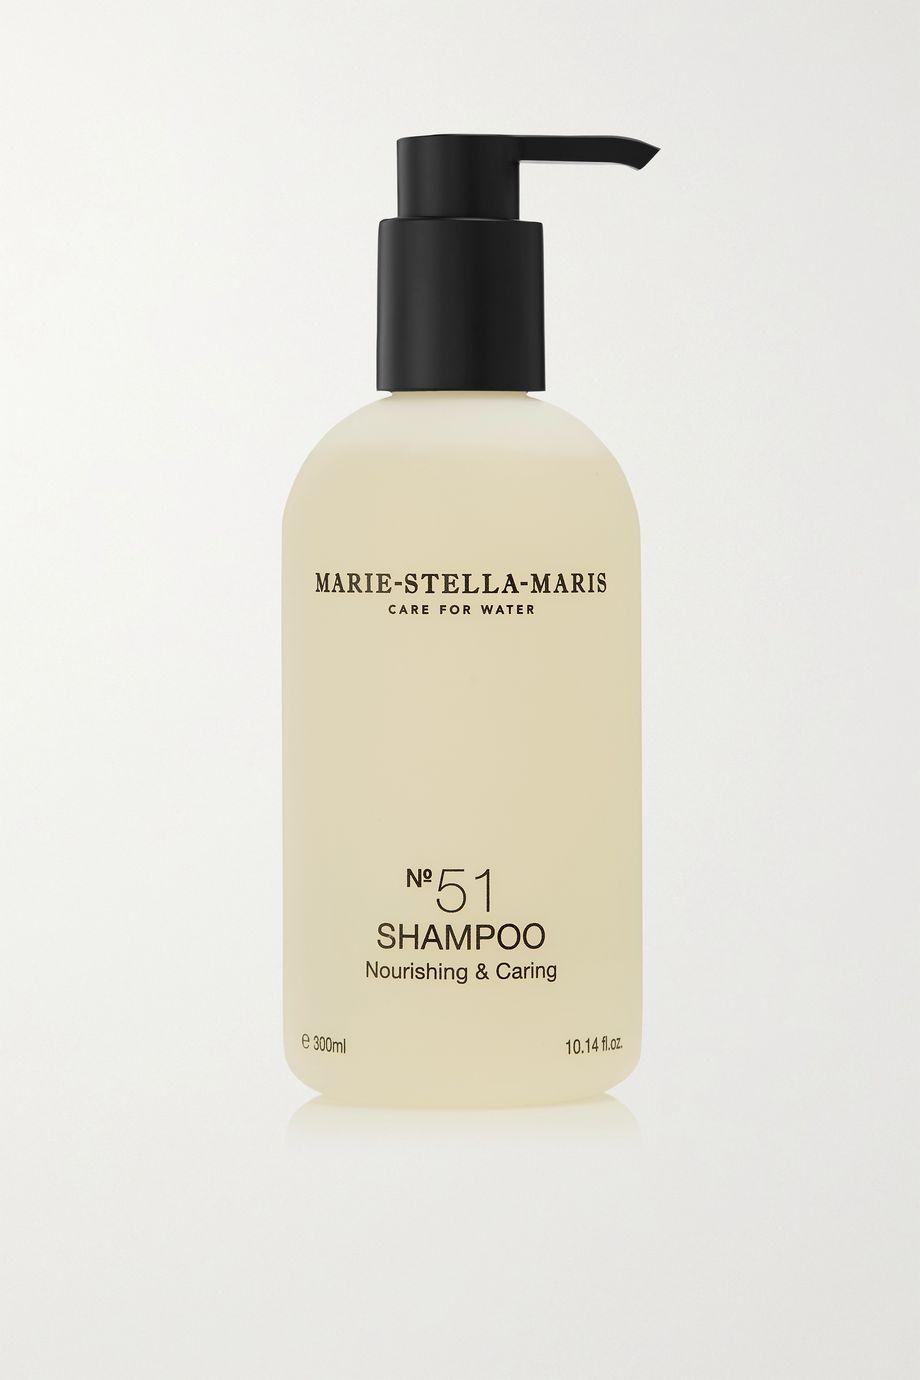 Marie-Stella-Maris No.51 Nourishing and Caring Shampoo, 300ml